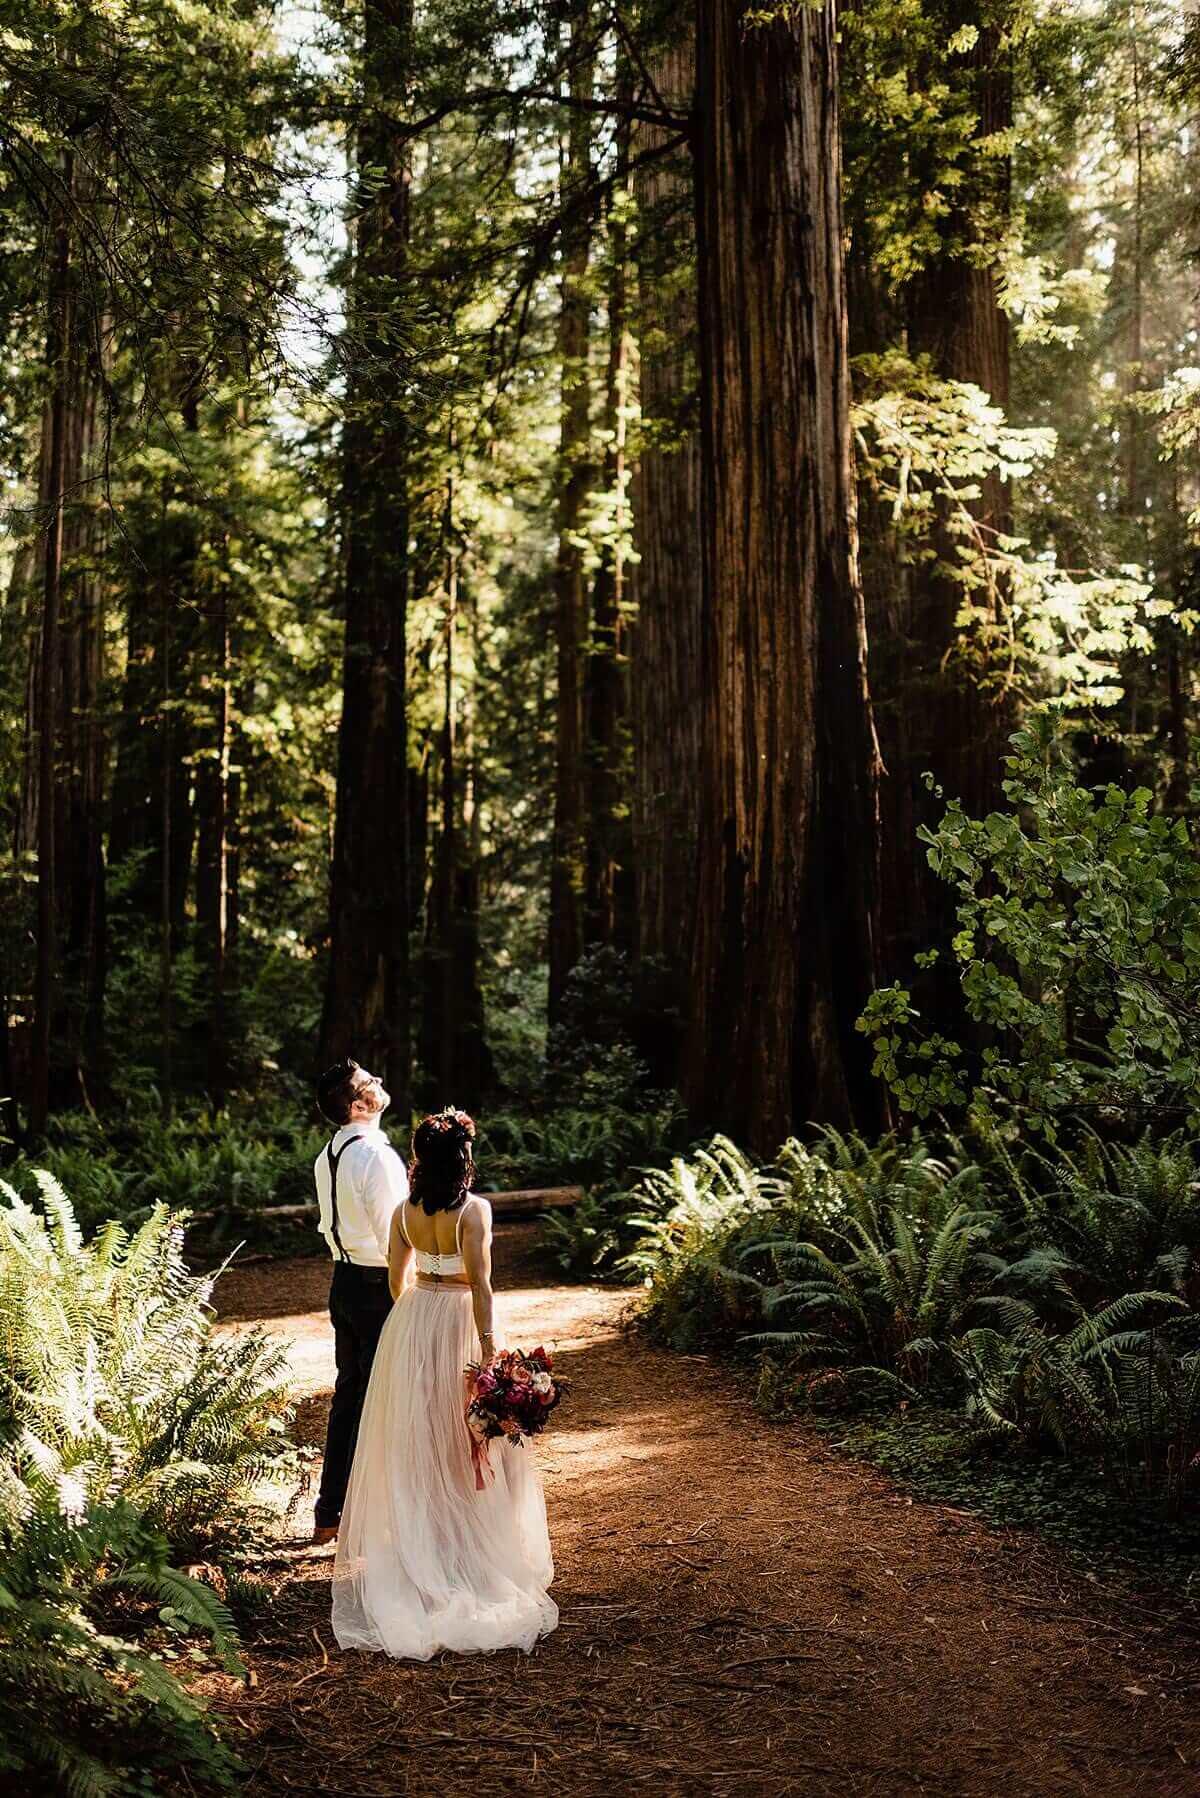 Allison-Brooks-Jedediah-Smiith-Redwoods-Adventure-Elopement-Wedding-S-Photography-Blog_0040.jpg